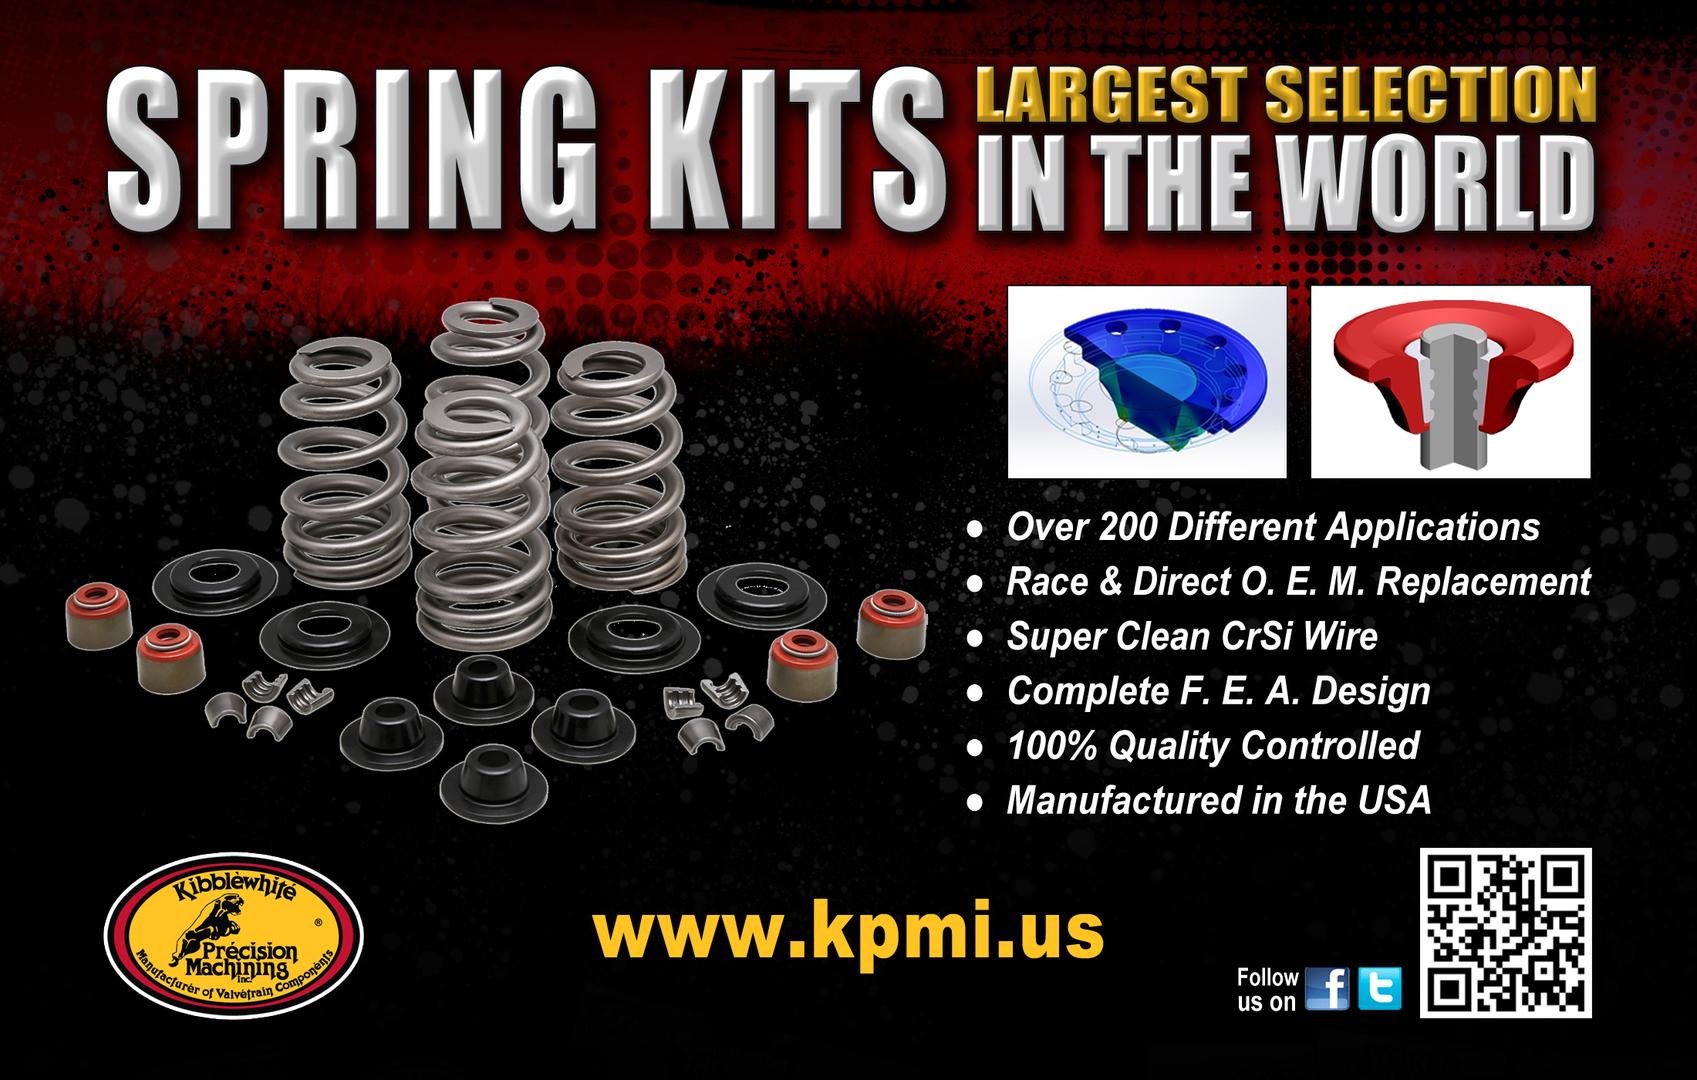 Kibblewhite Precision Machining Inc Motorcycle Valvetrain Custom 1974 Kawasaki H1 500 Wiring Diagram Work